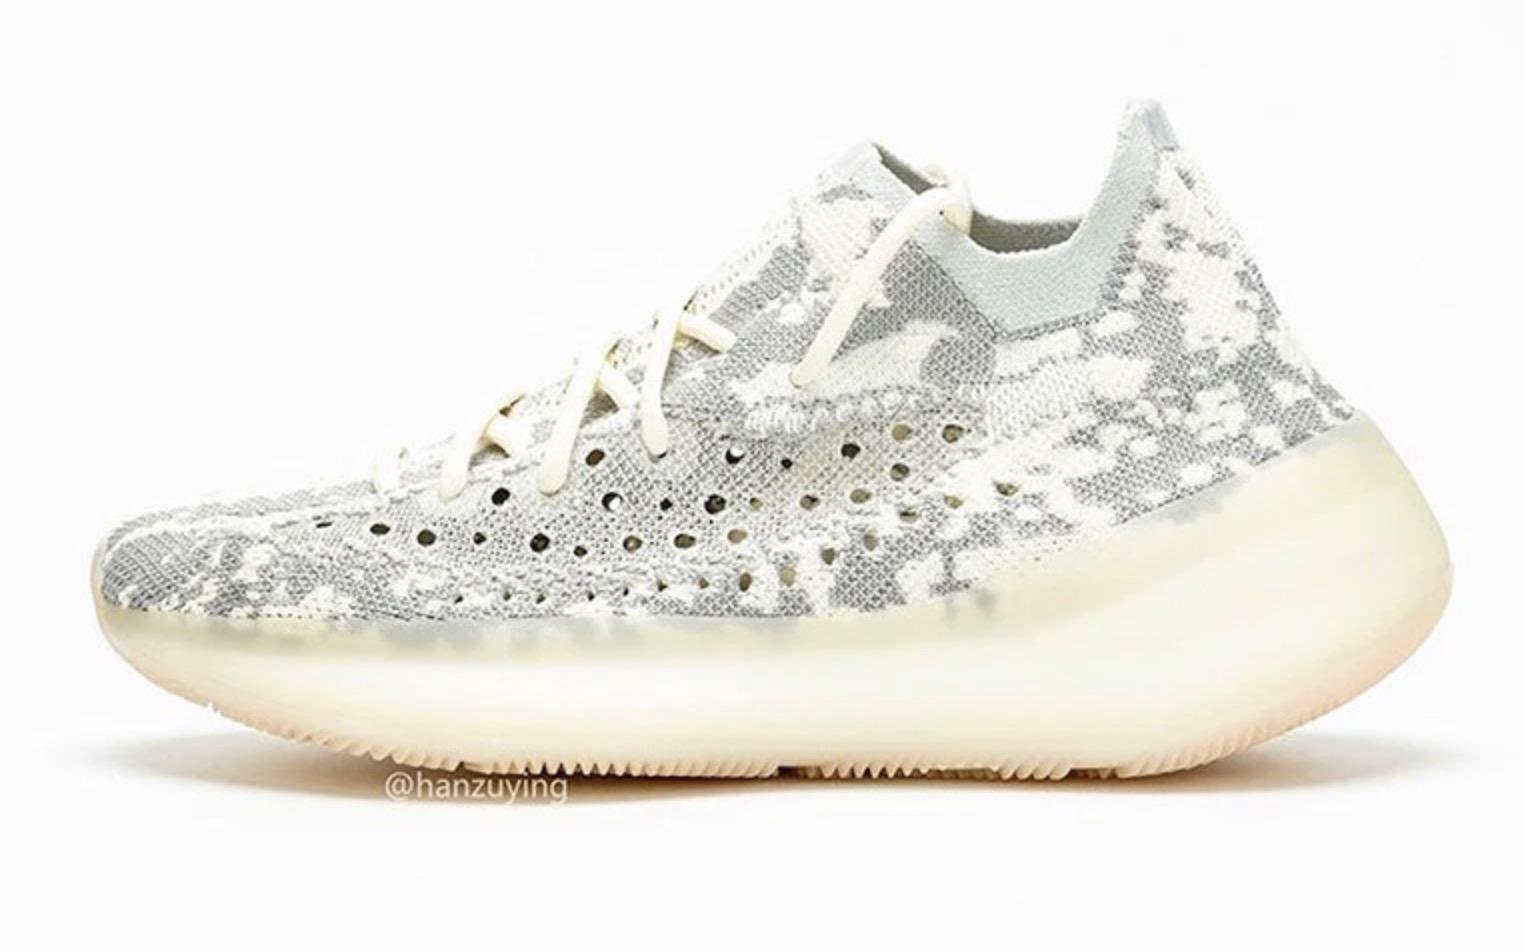 adidas-yeezy-boost-350-v3-alien-fb6878